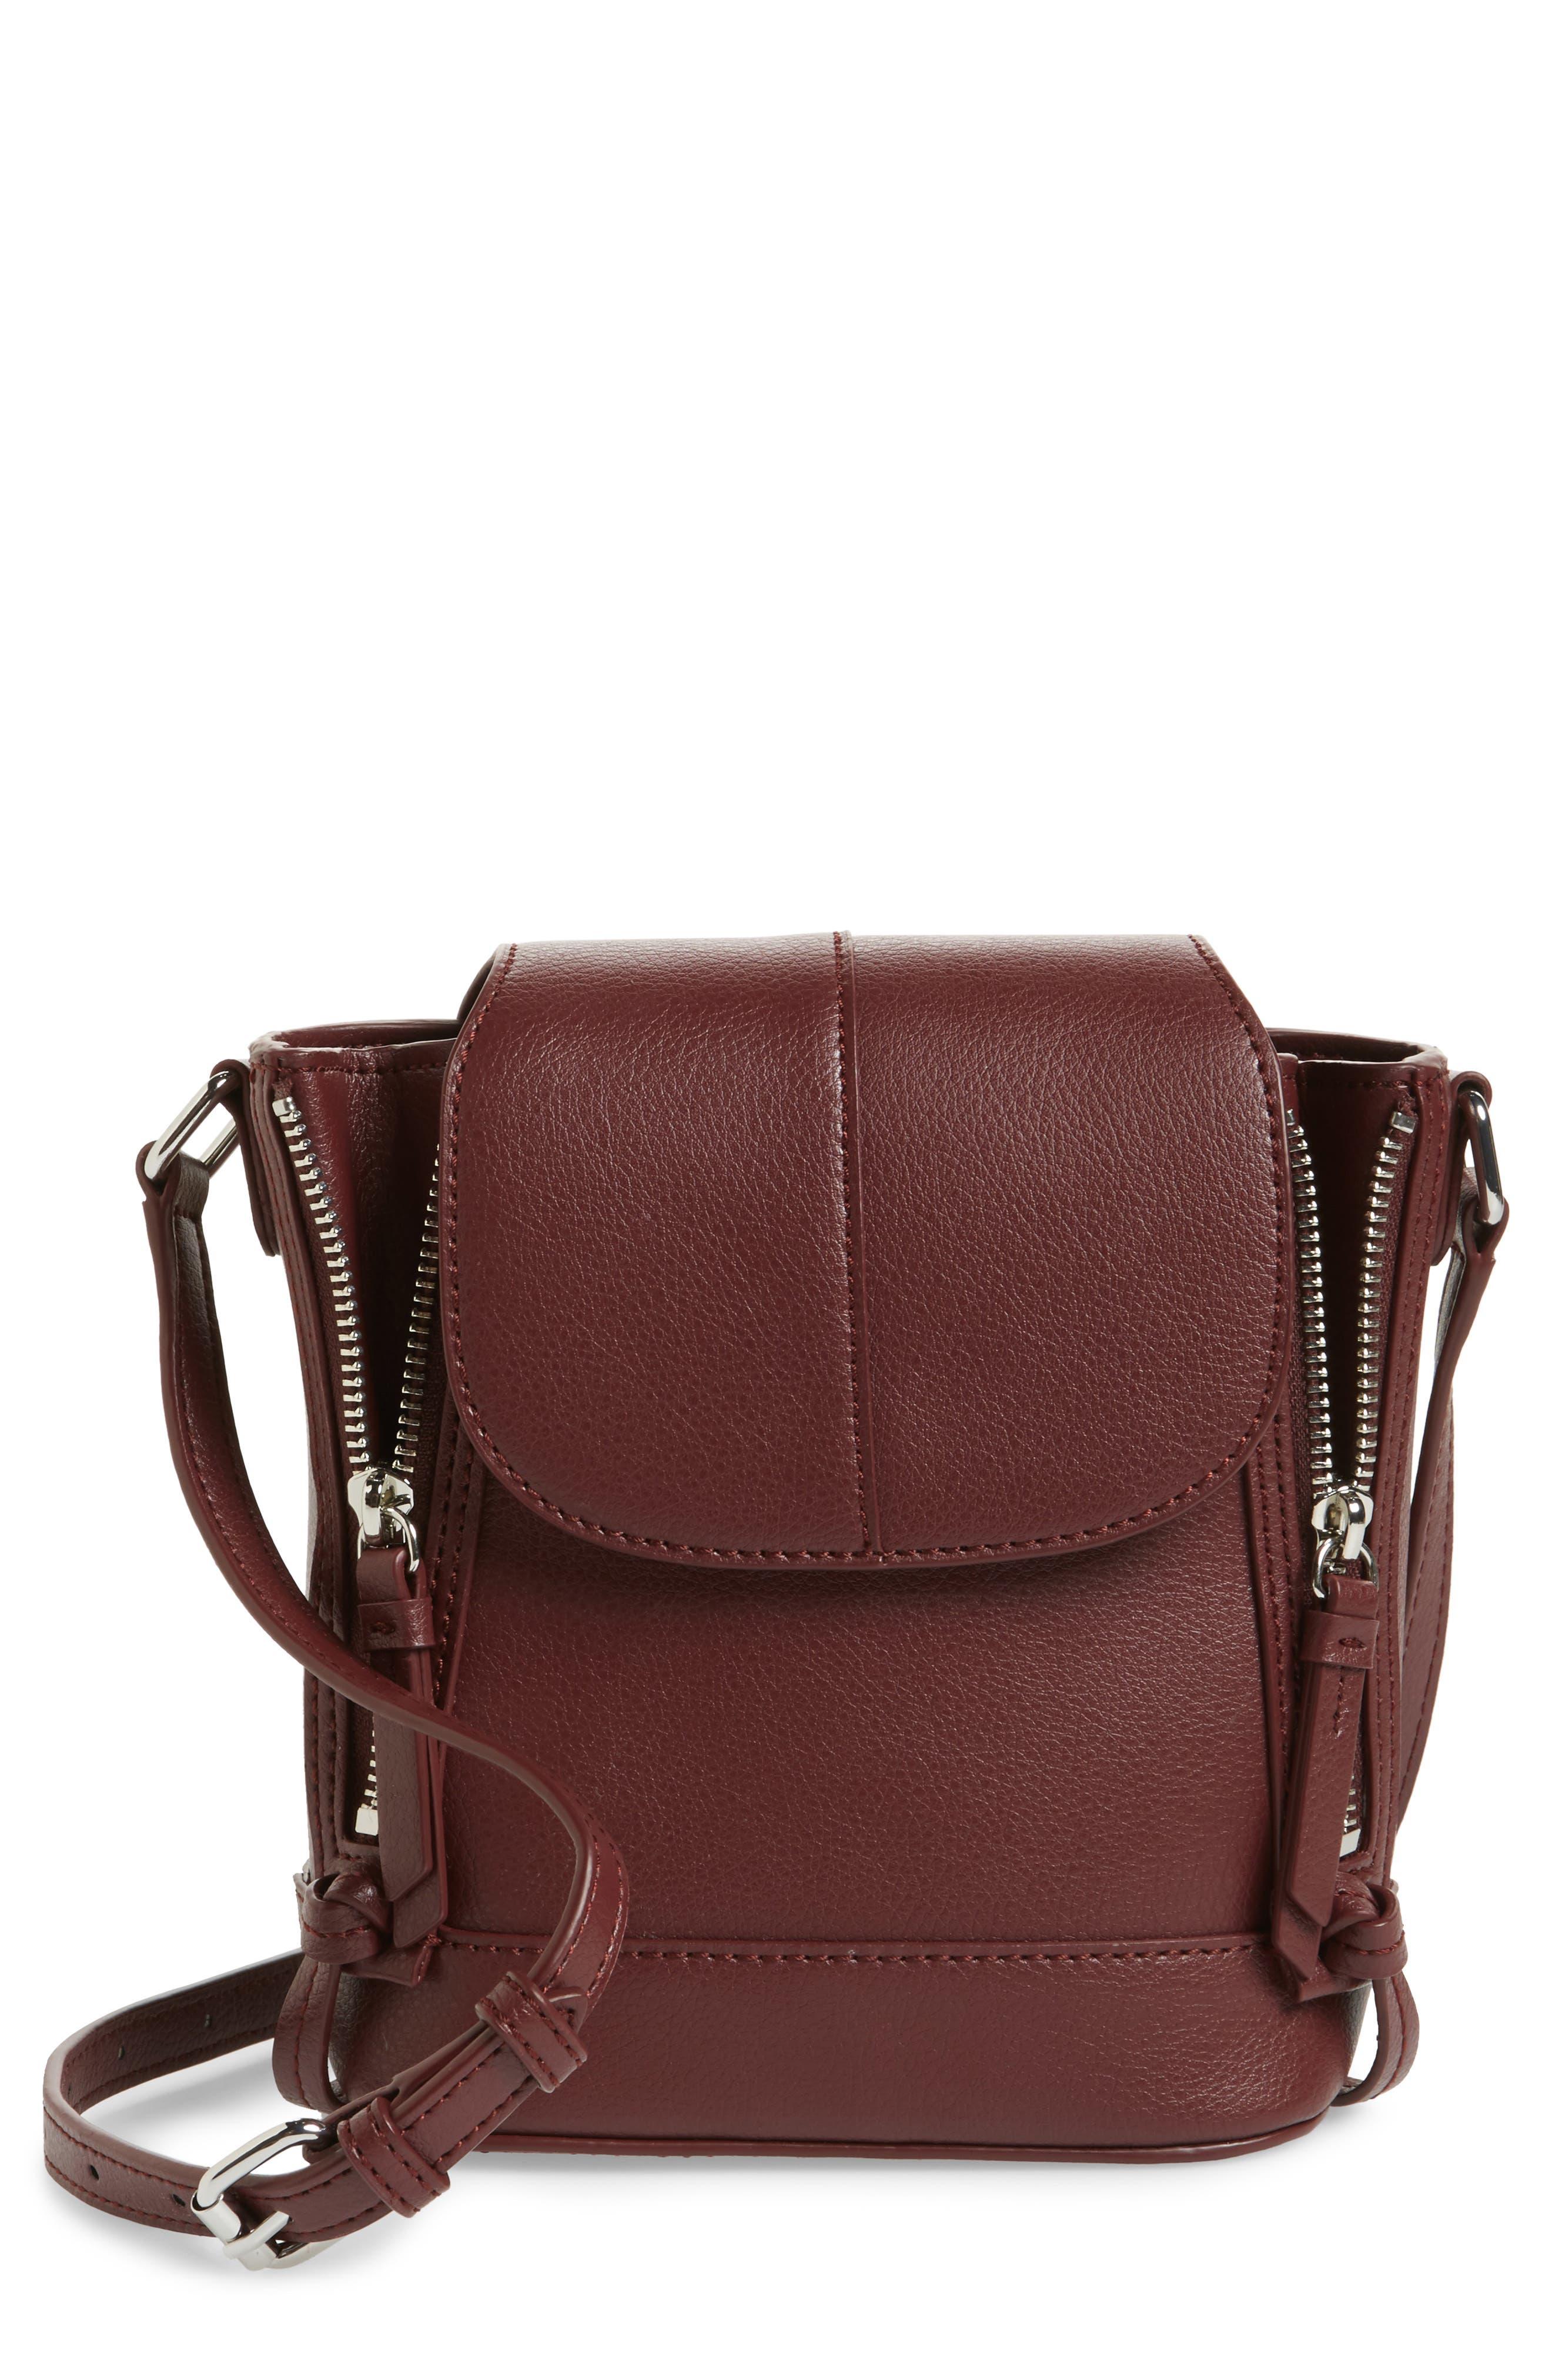 Beckett Leather Crossbody Bag,                         Main,                         color, Wine